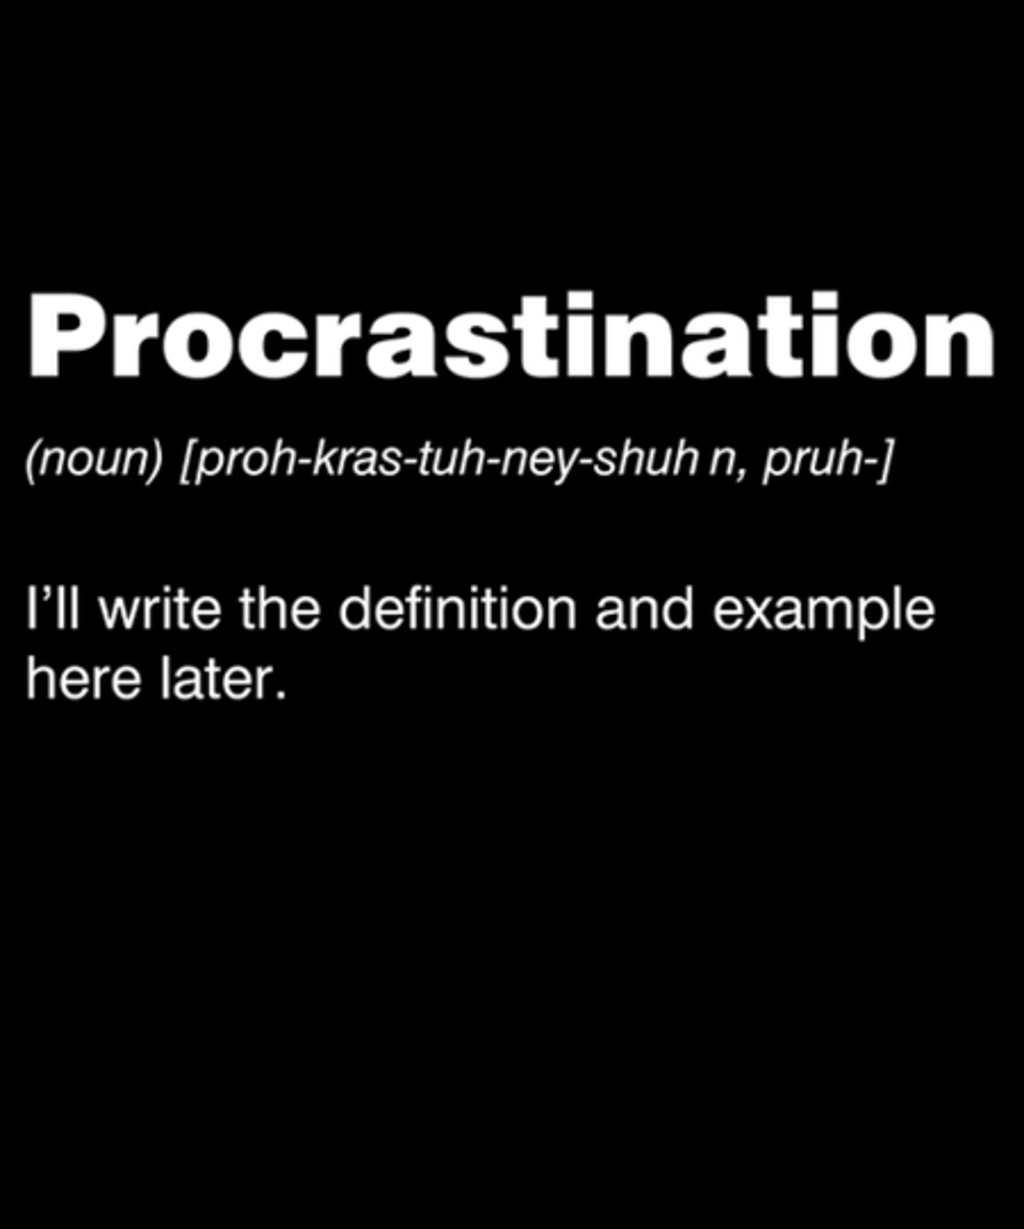 Qwertee: Procrastination